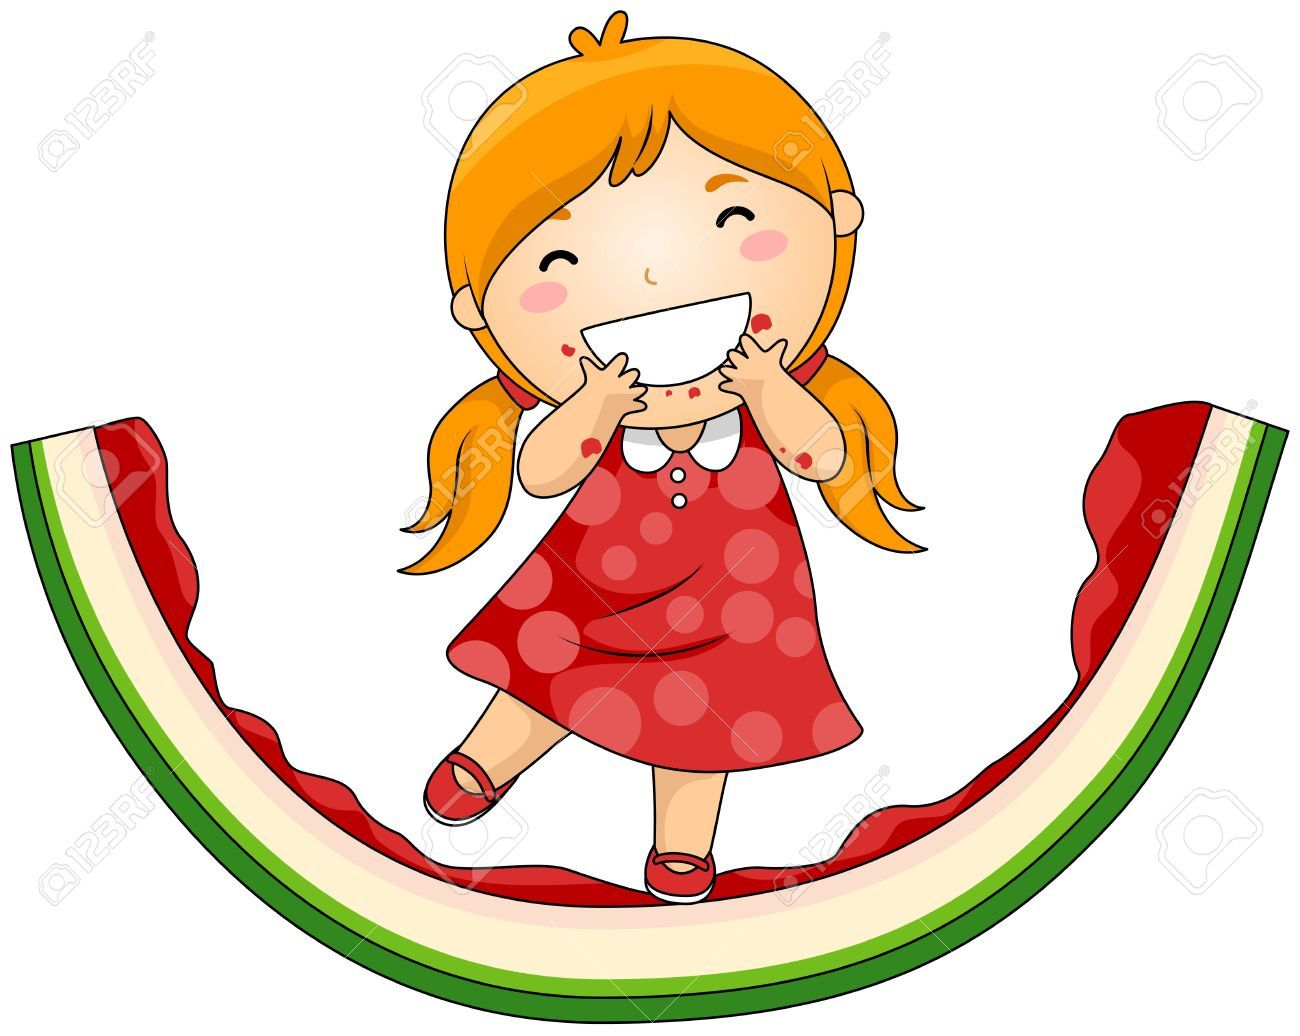 Eating watermelon clipart svg transparent download Eating watermelon clipart 9 » Clipart Portal svg transparent download